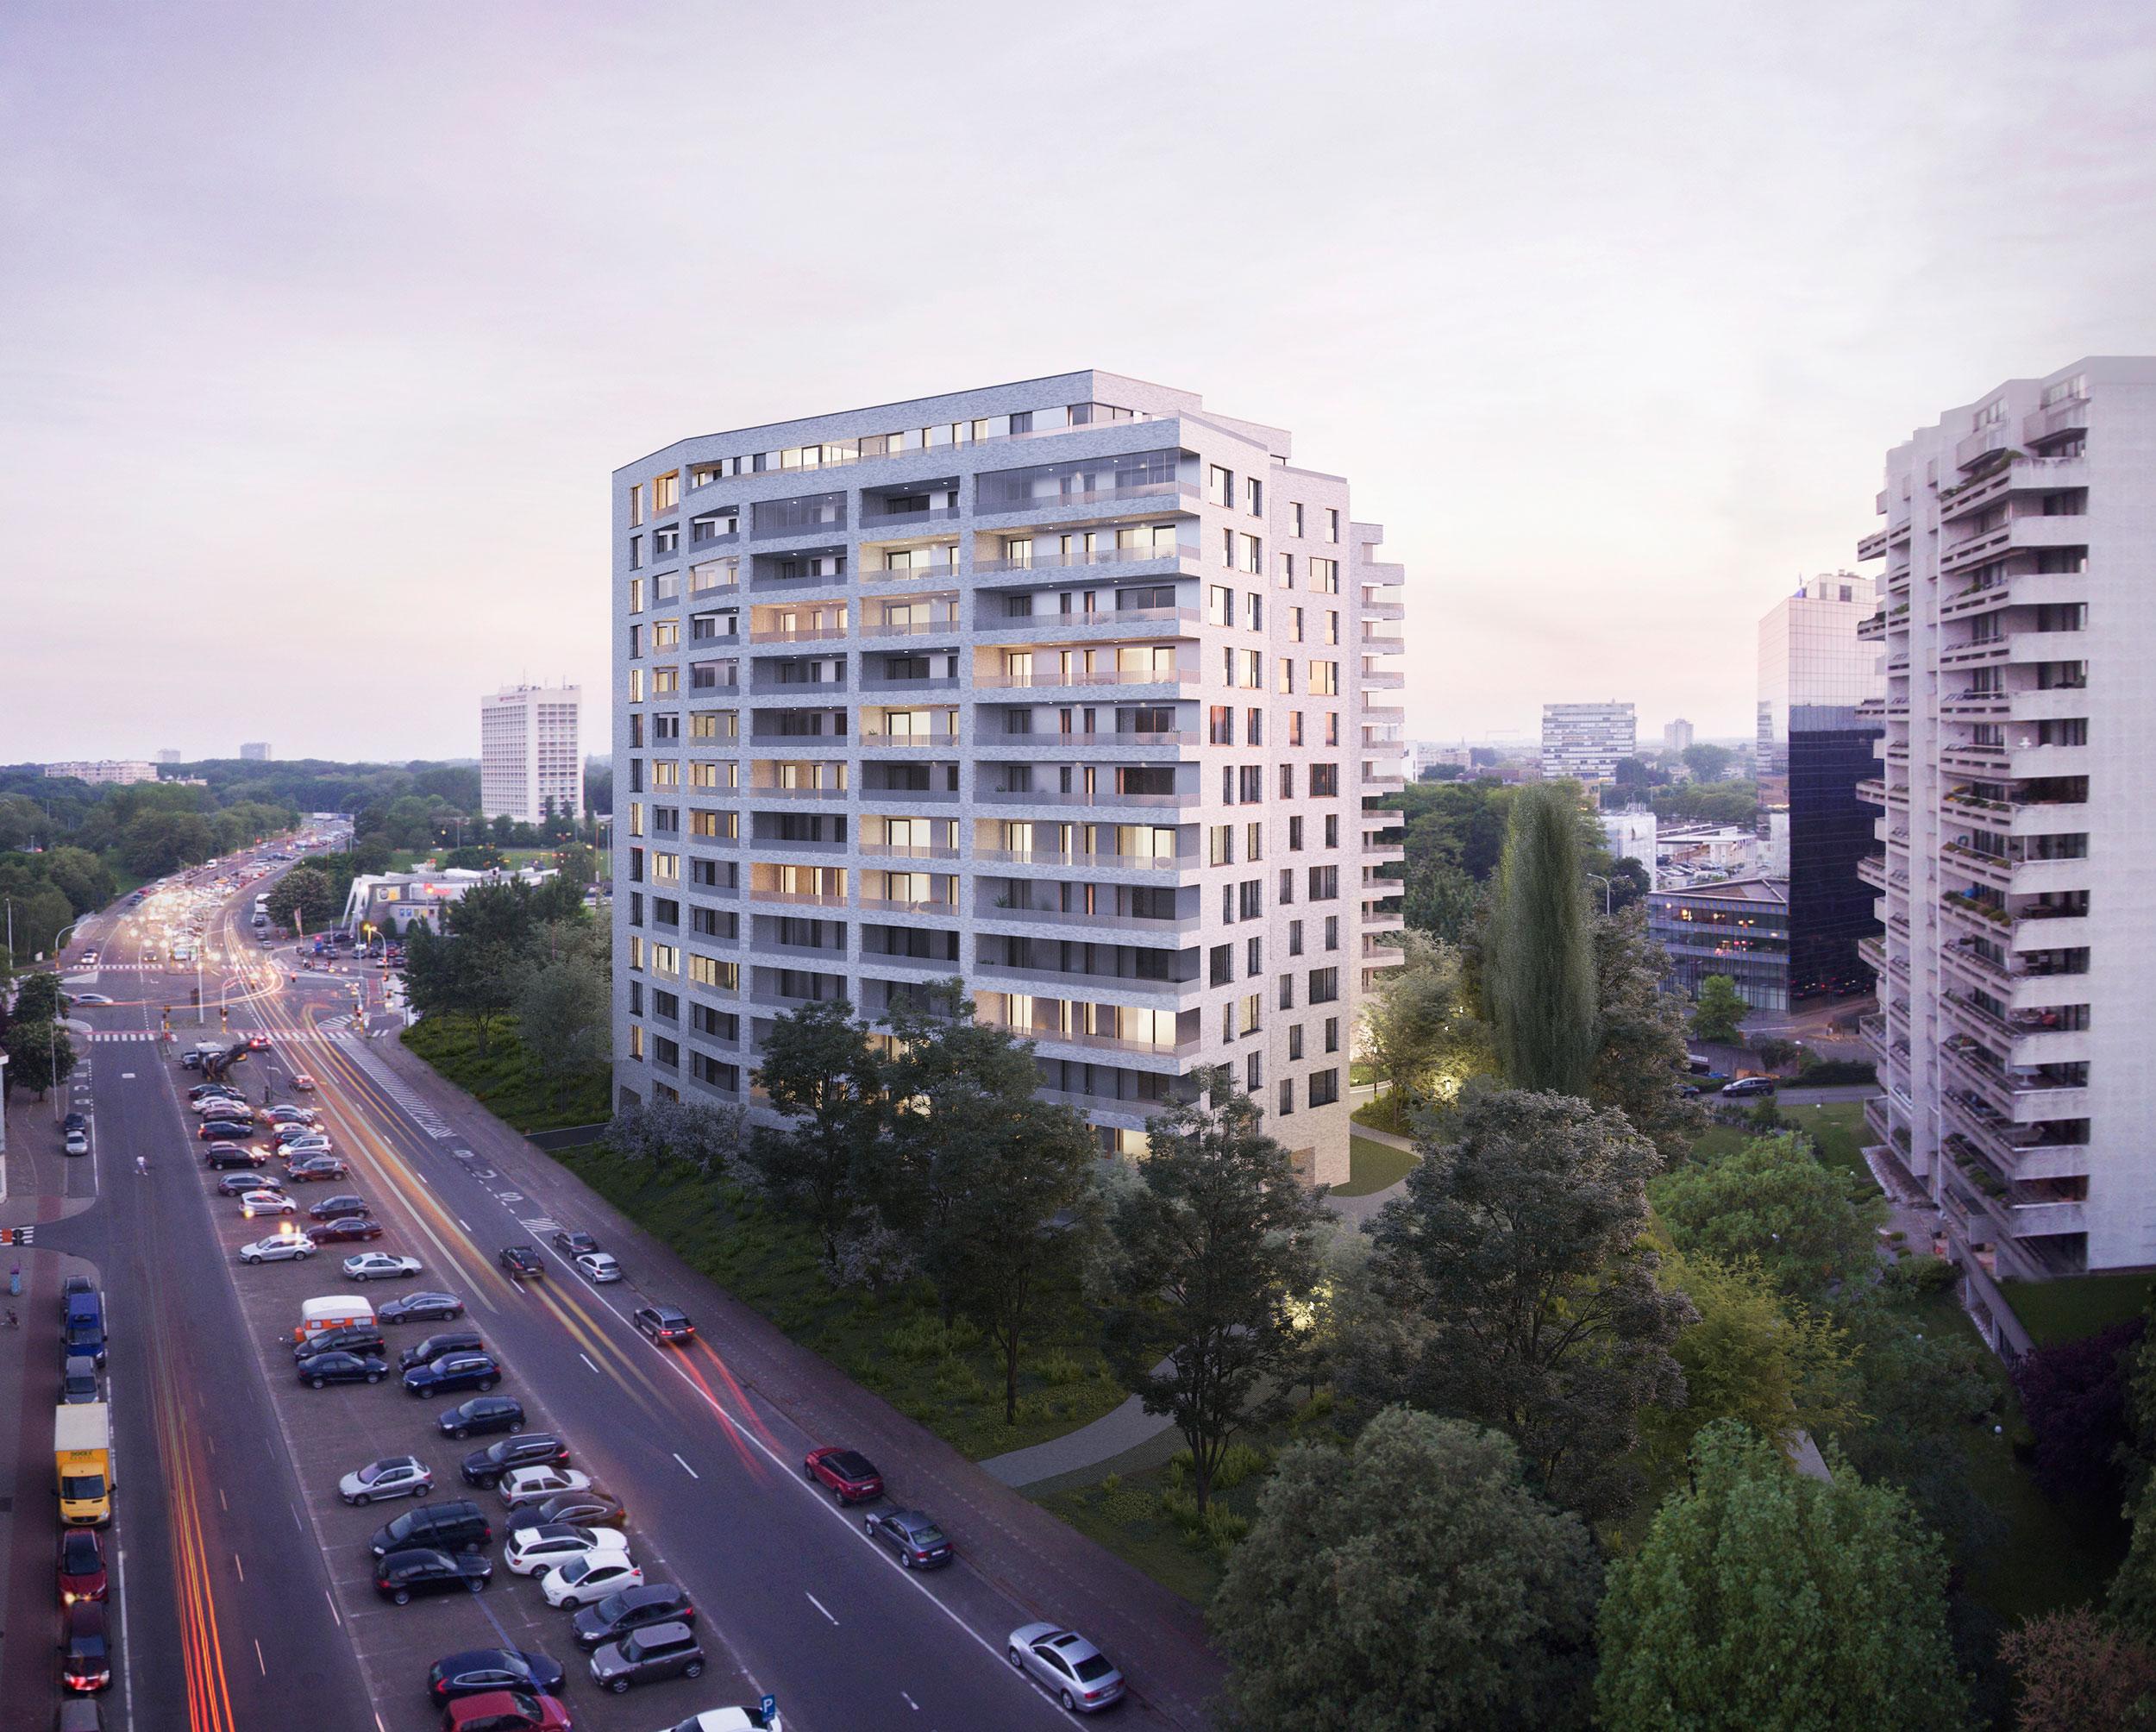 focus-archi-magazine-architecture-archinews-Louise-Marie-Antwerpen_CAM_03_AERIAL_PARC-01.jpg